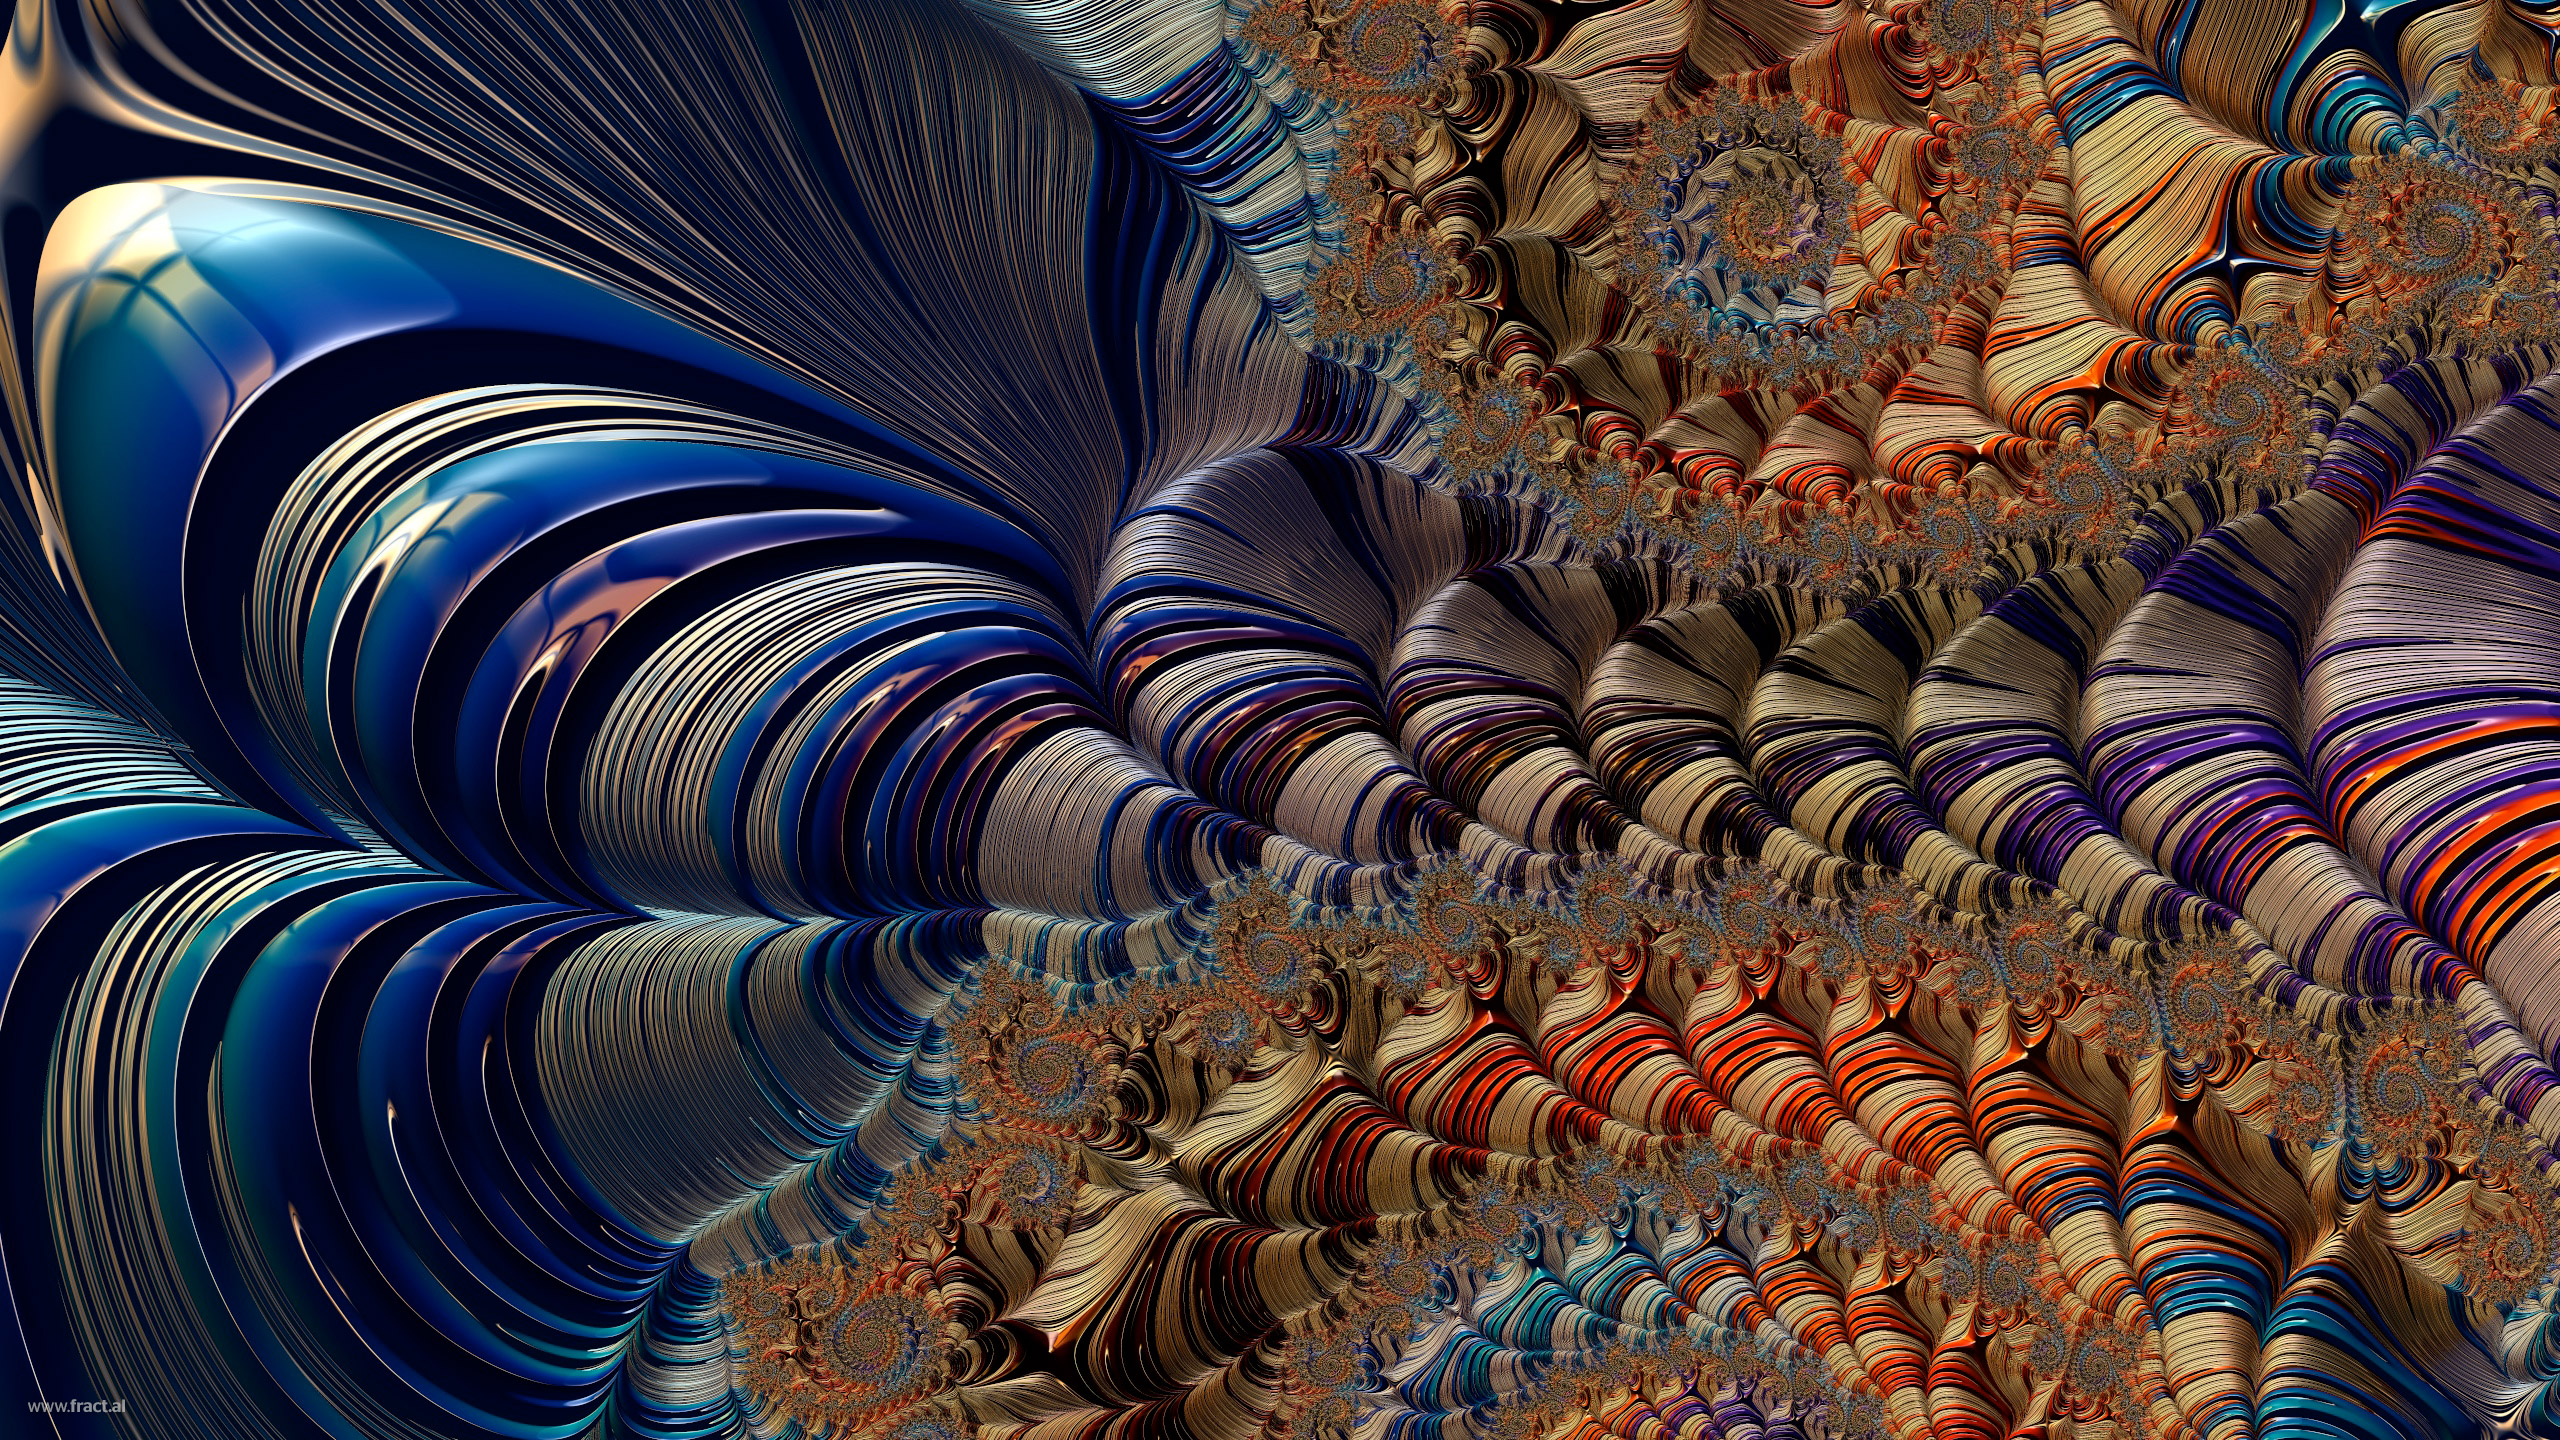 Wallpaper Full Hd Abstract Showcase 1 Frax